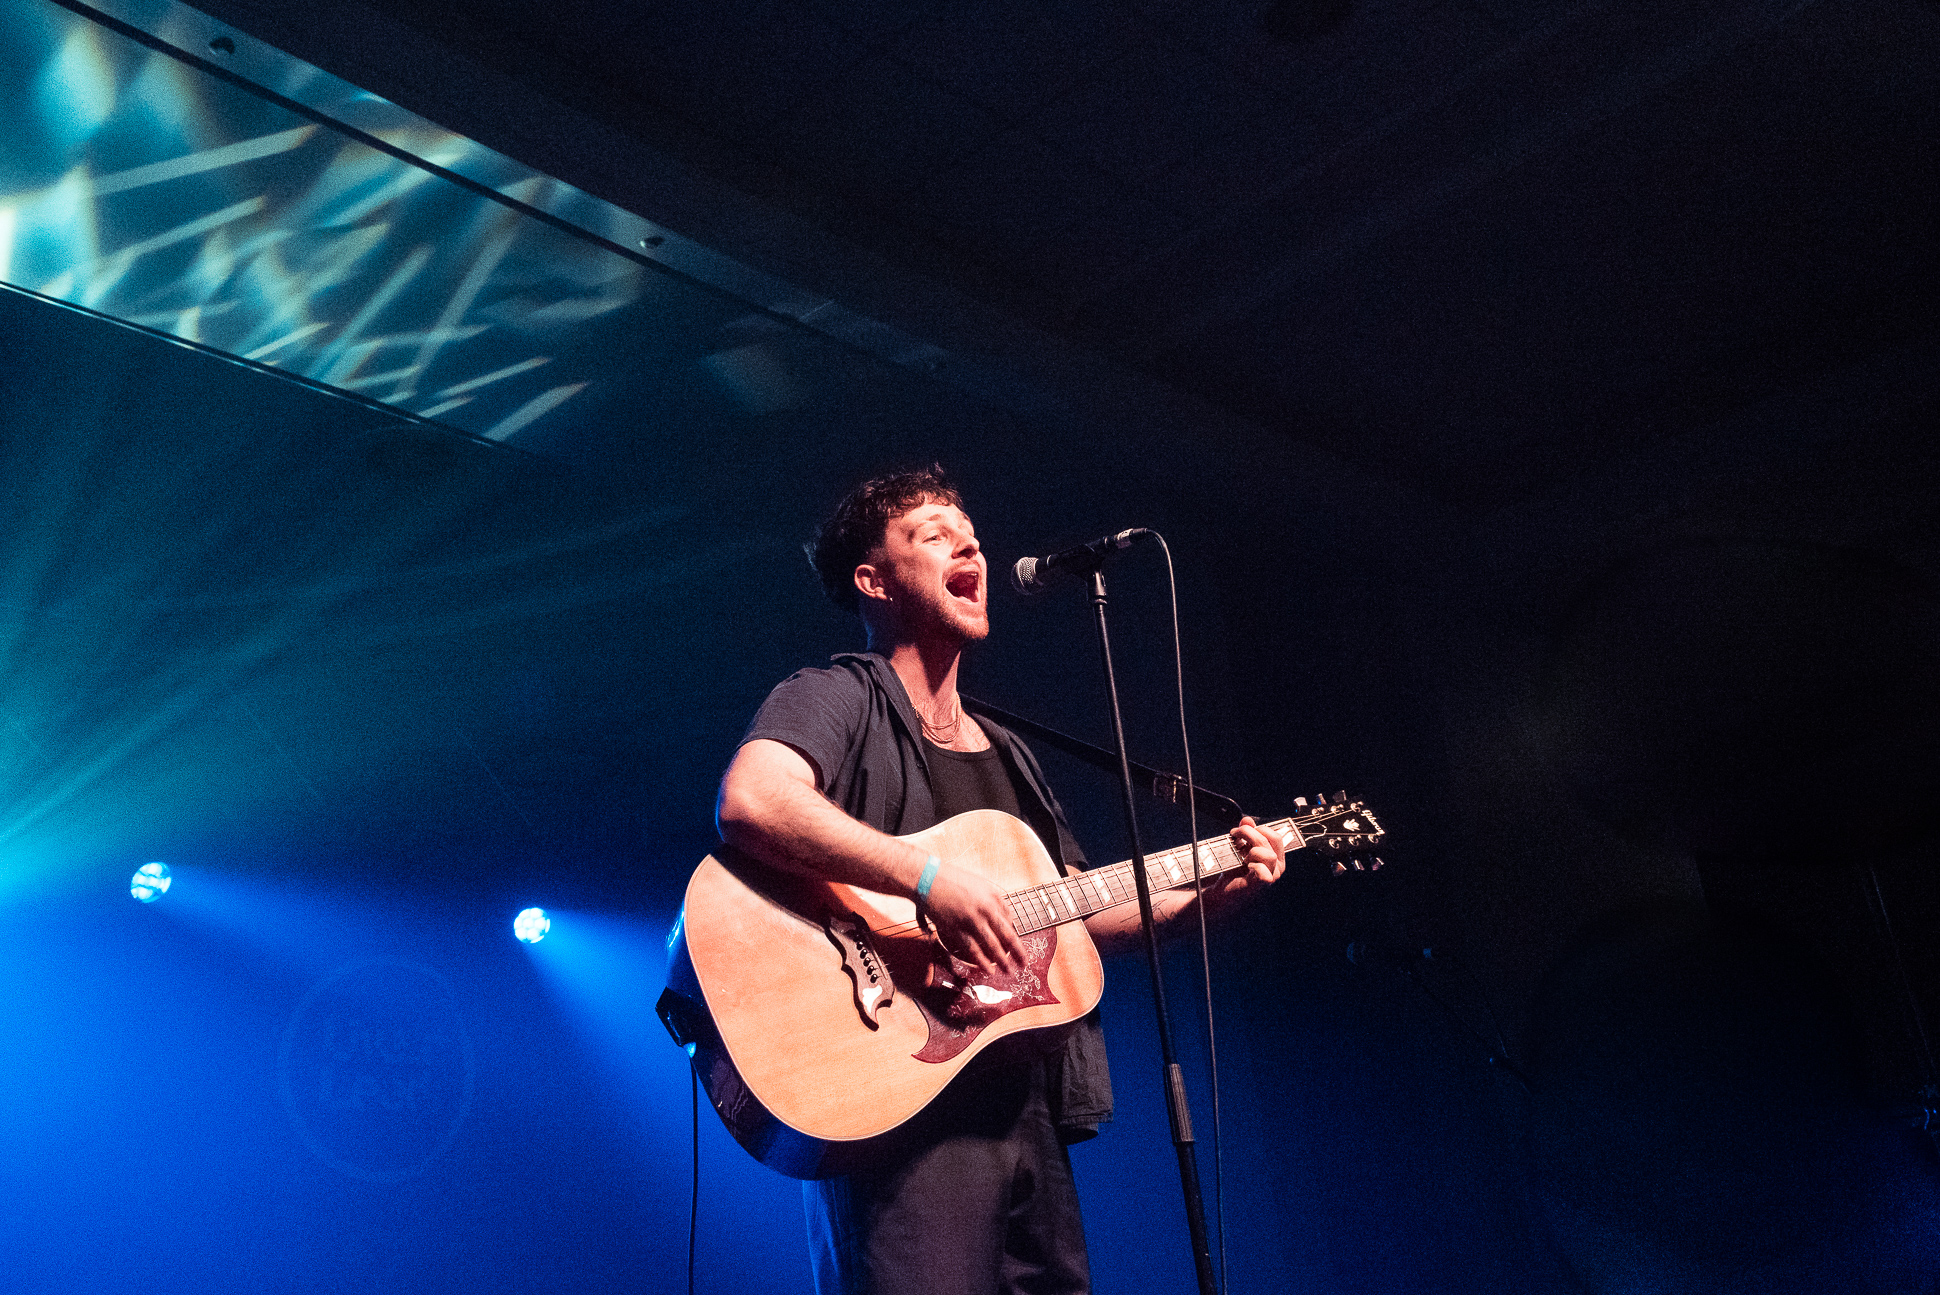 Live At Leeds 2019 - Tom Grennan_.jpg